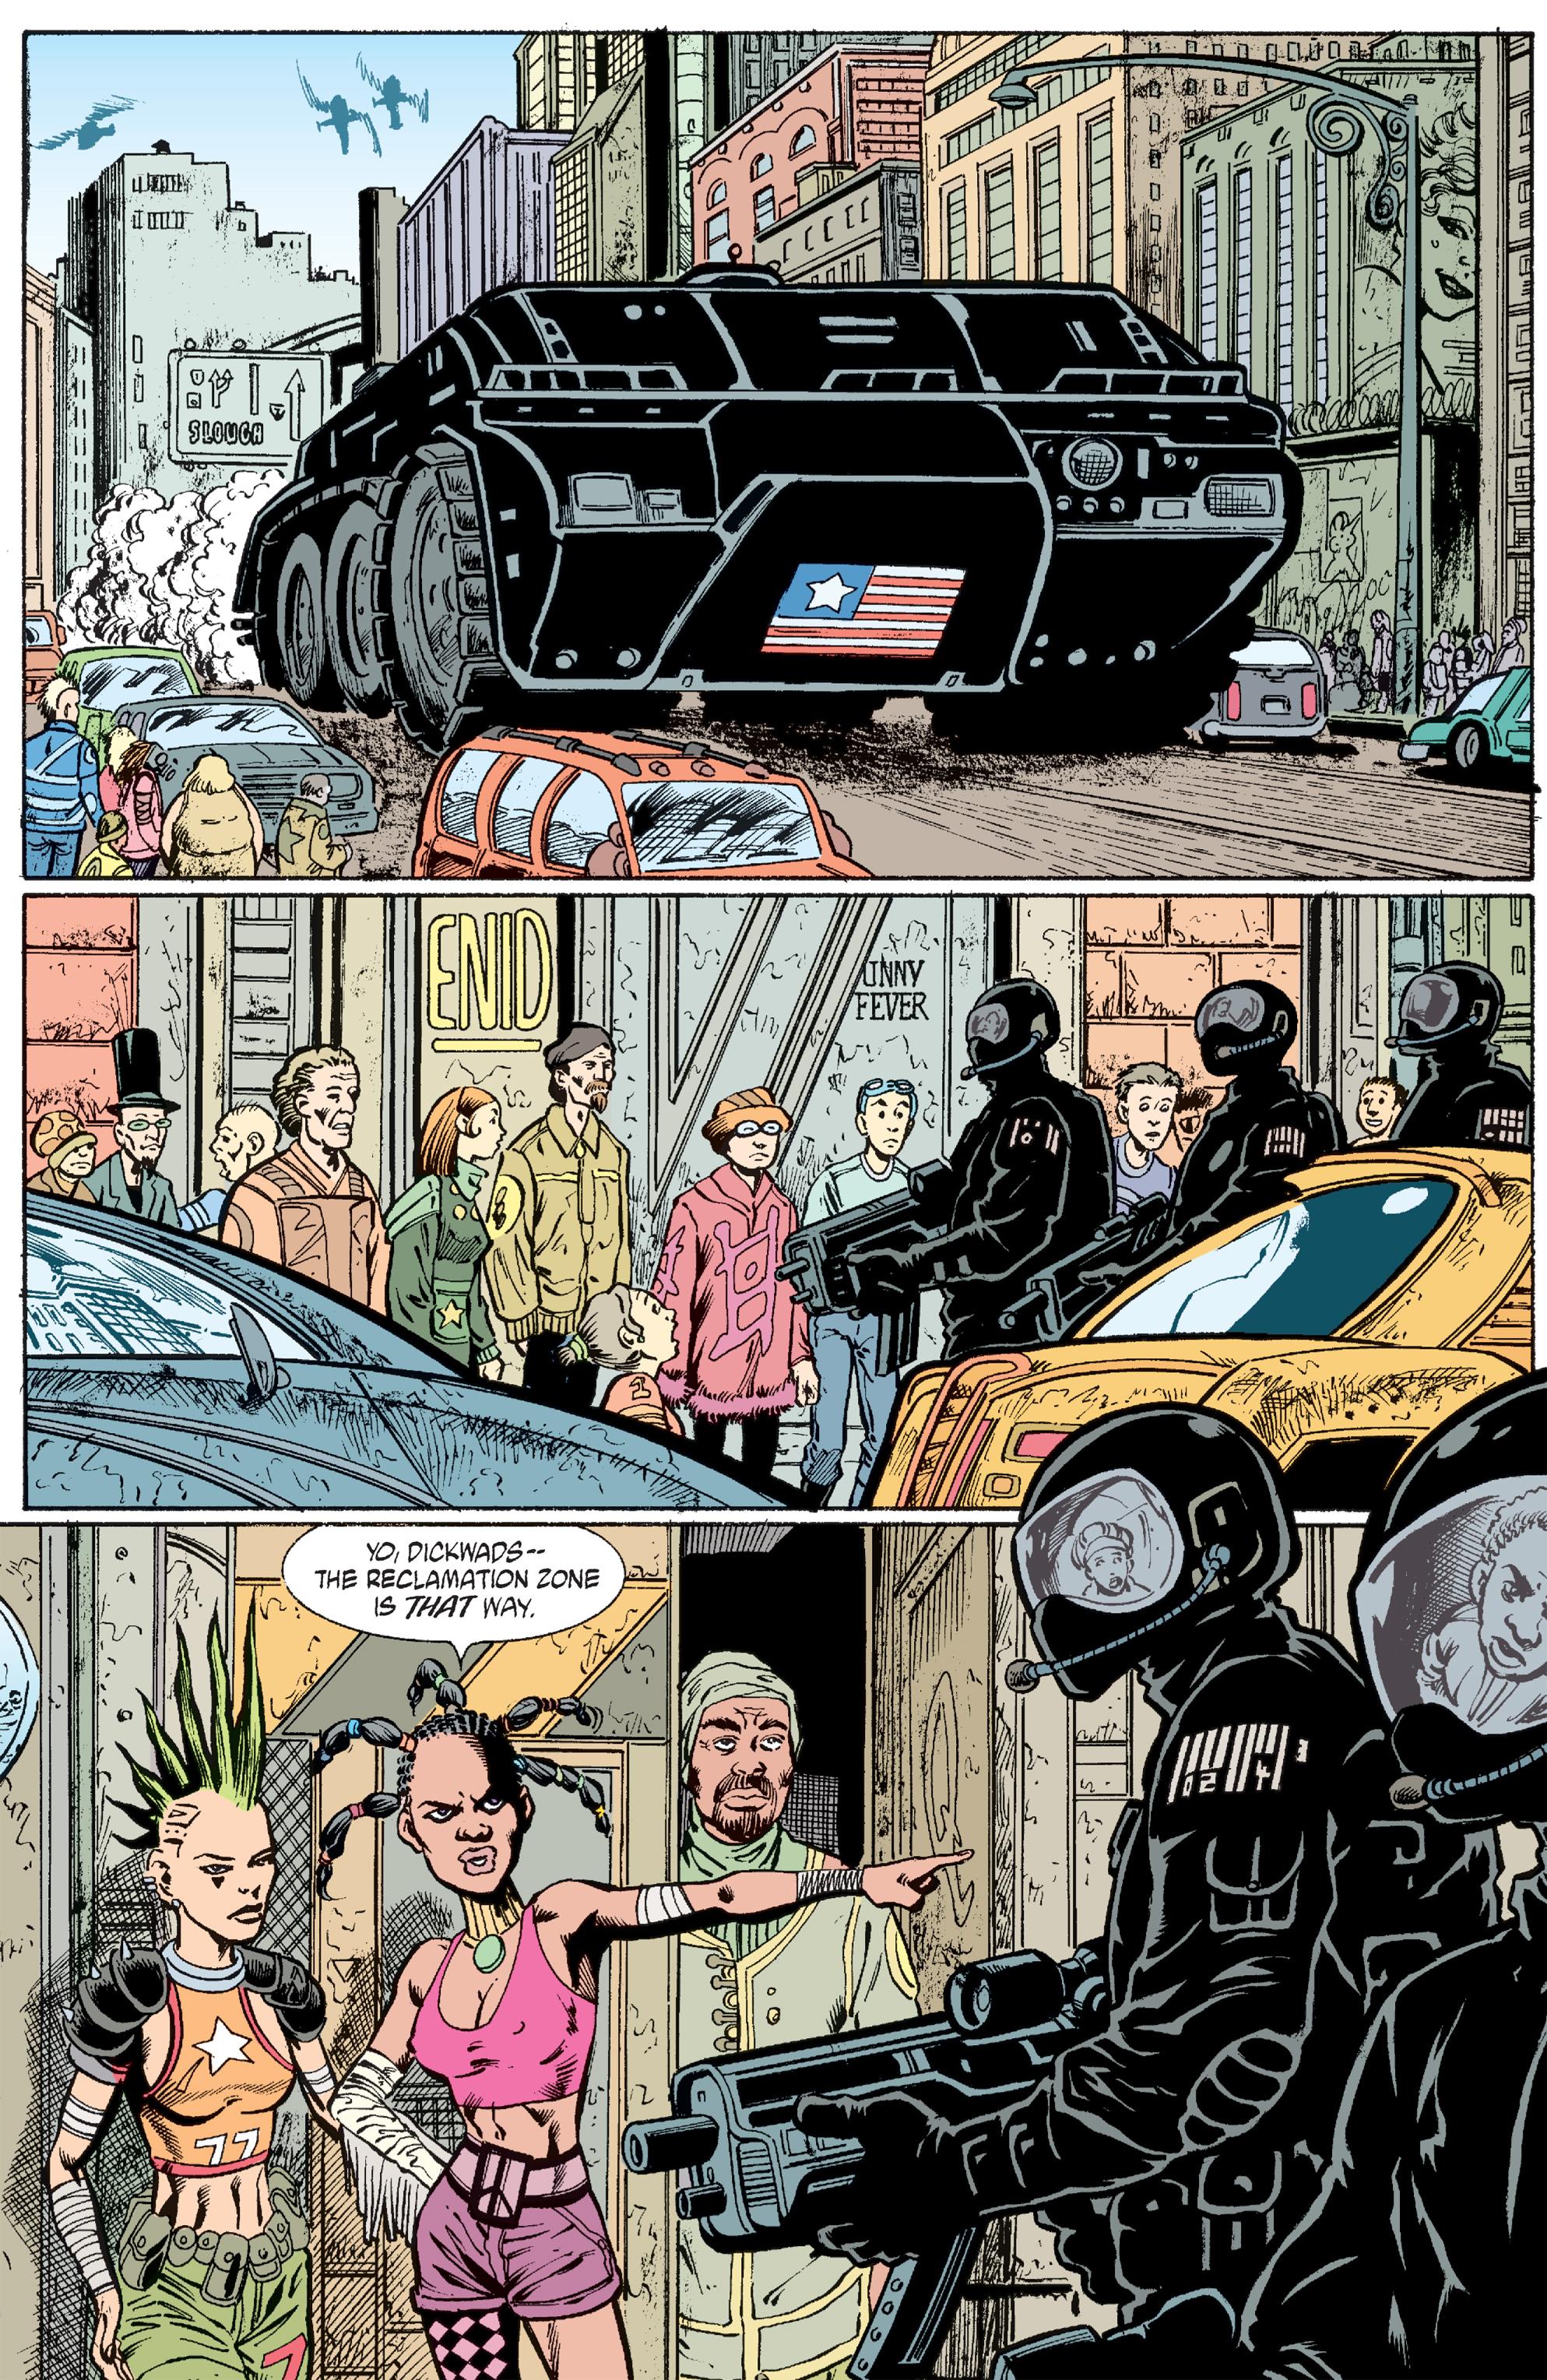 Read online Transmetropolitan comic -  Issue #56 - 3